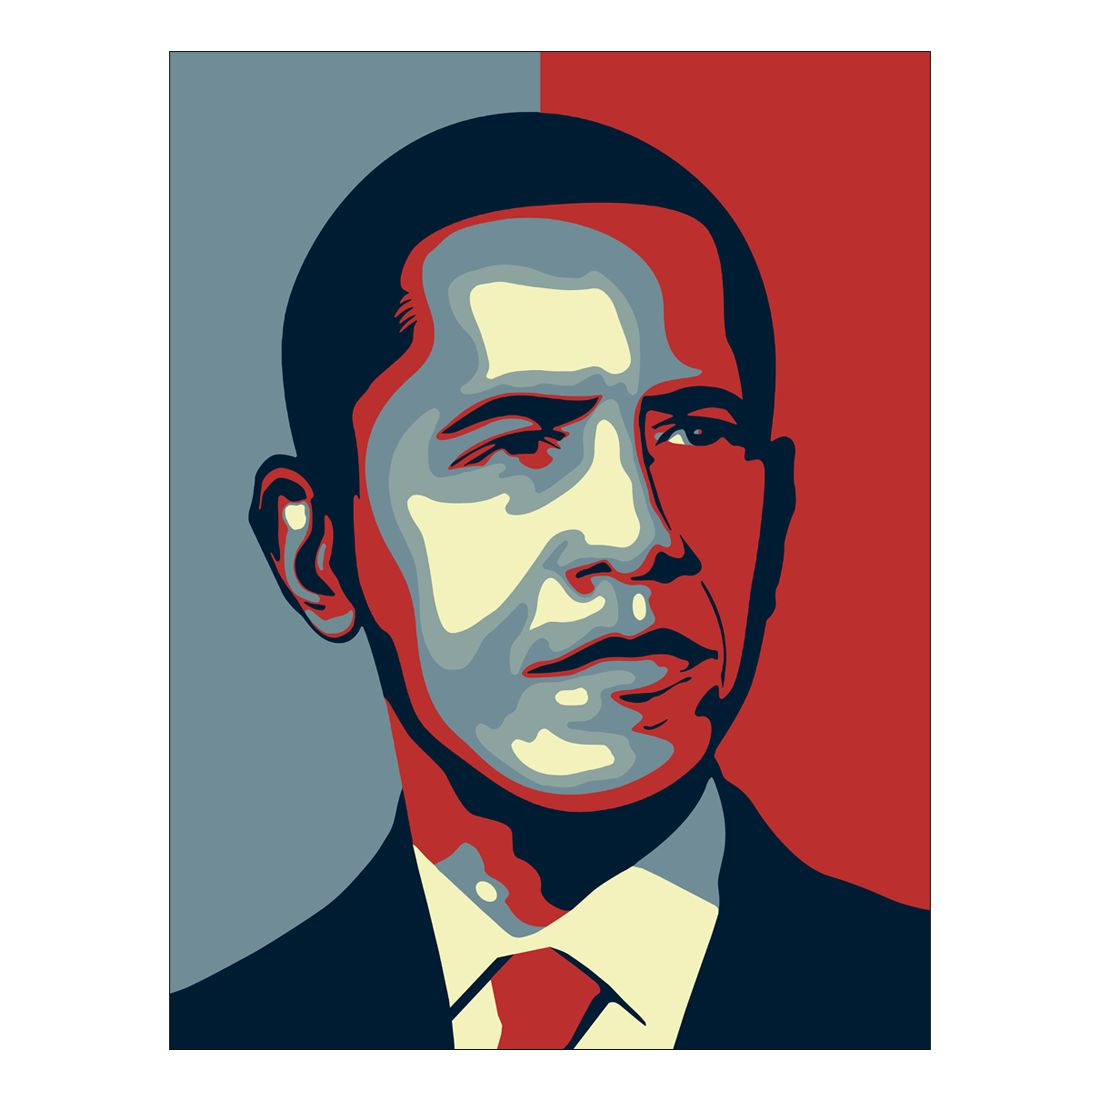 Leinwandbild Obama – 100 x 75cm, Gallery of Innovative Art bestellen